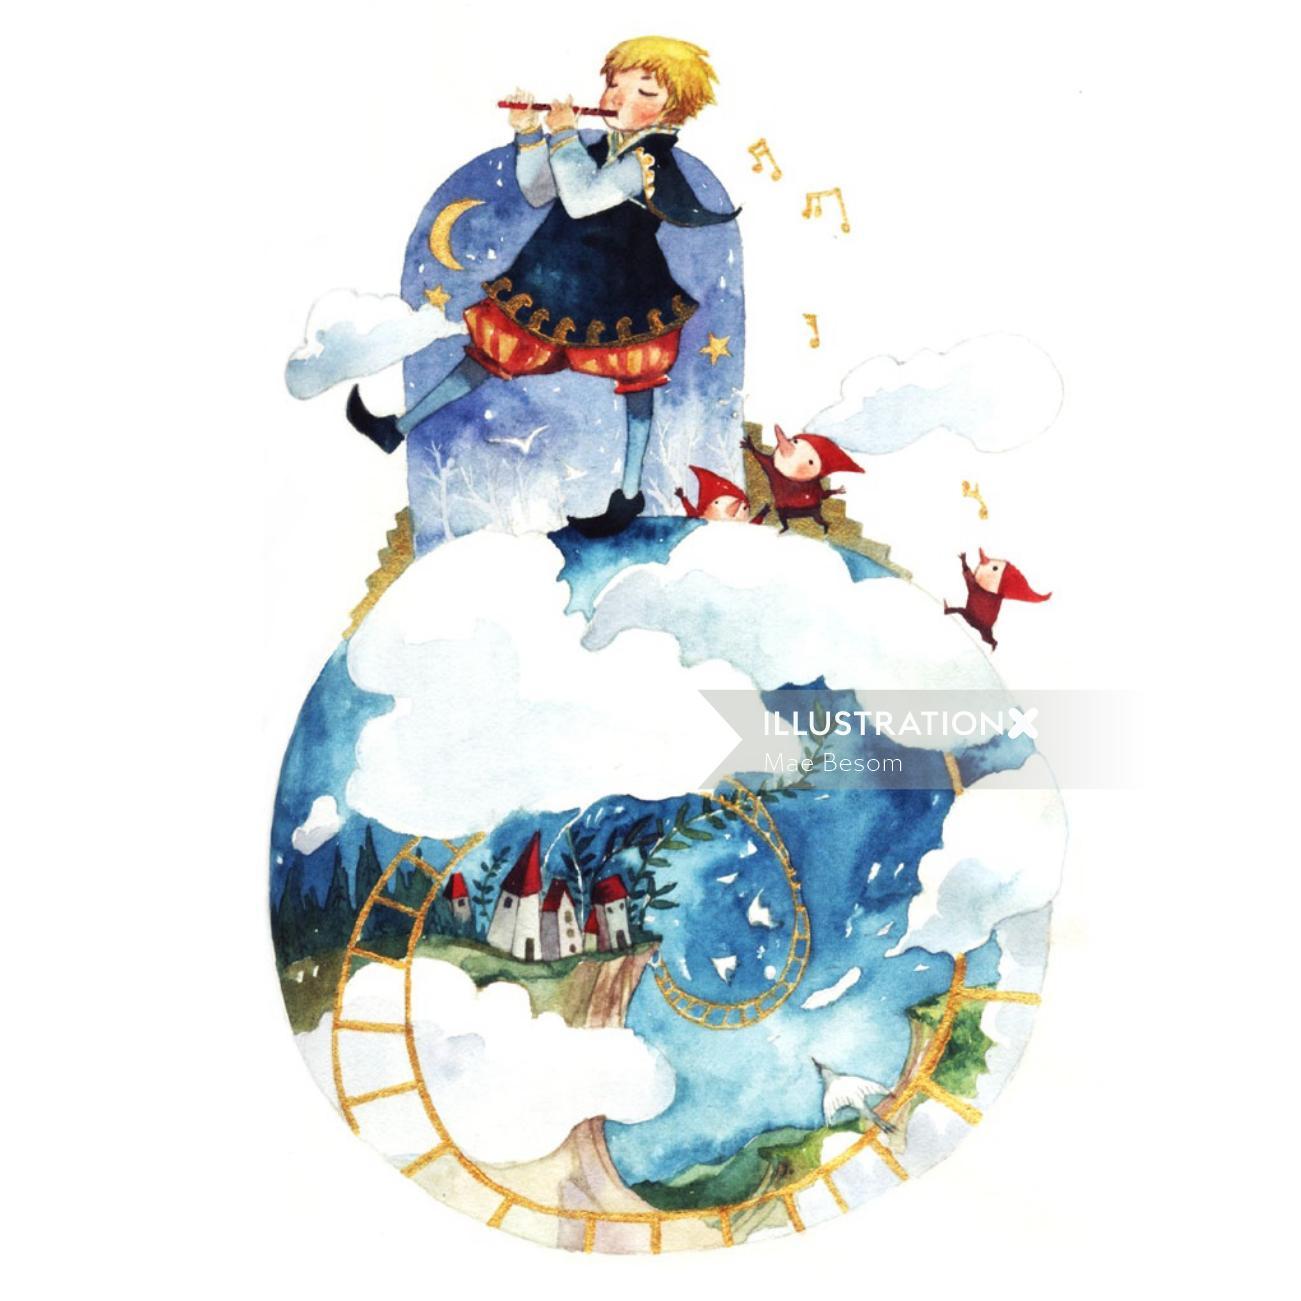 Fantasy illustration of girl playing flute